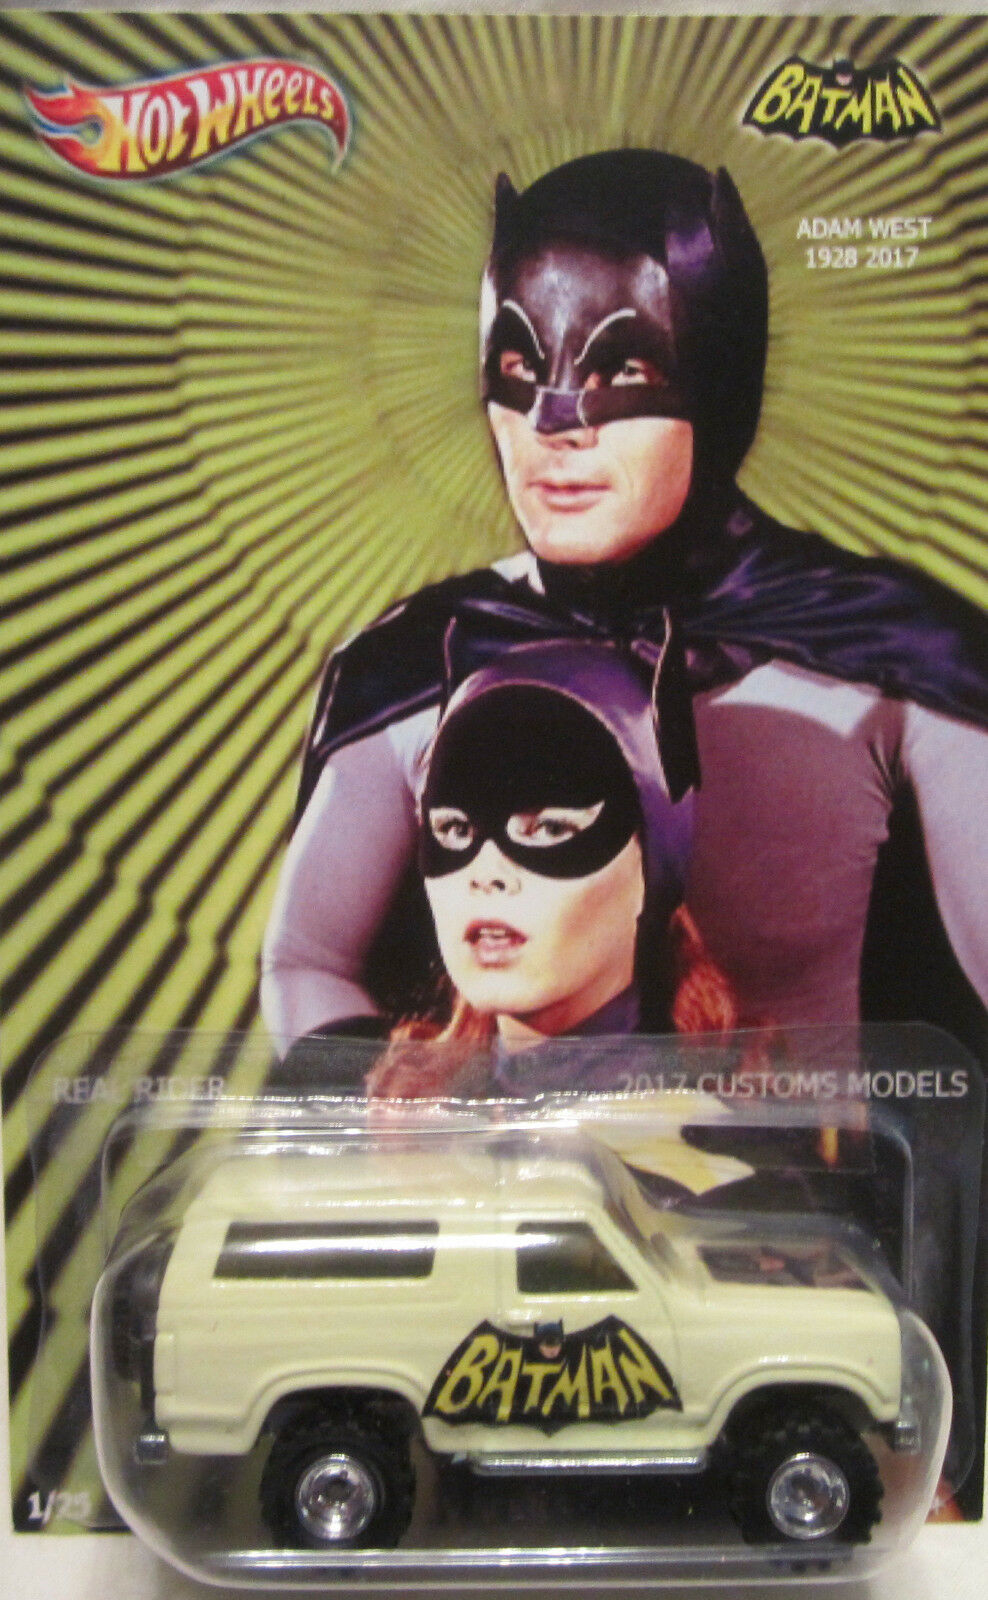 Hot Wheels CUSTOM '85 FORD BRONCO Batman-Adam West Tribute Real Riders 1 25 Made